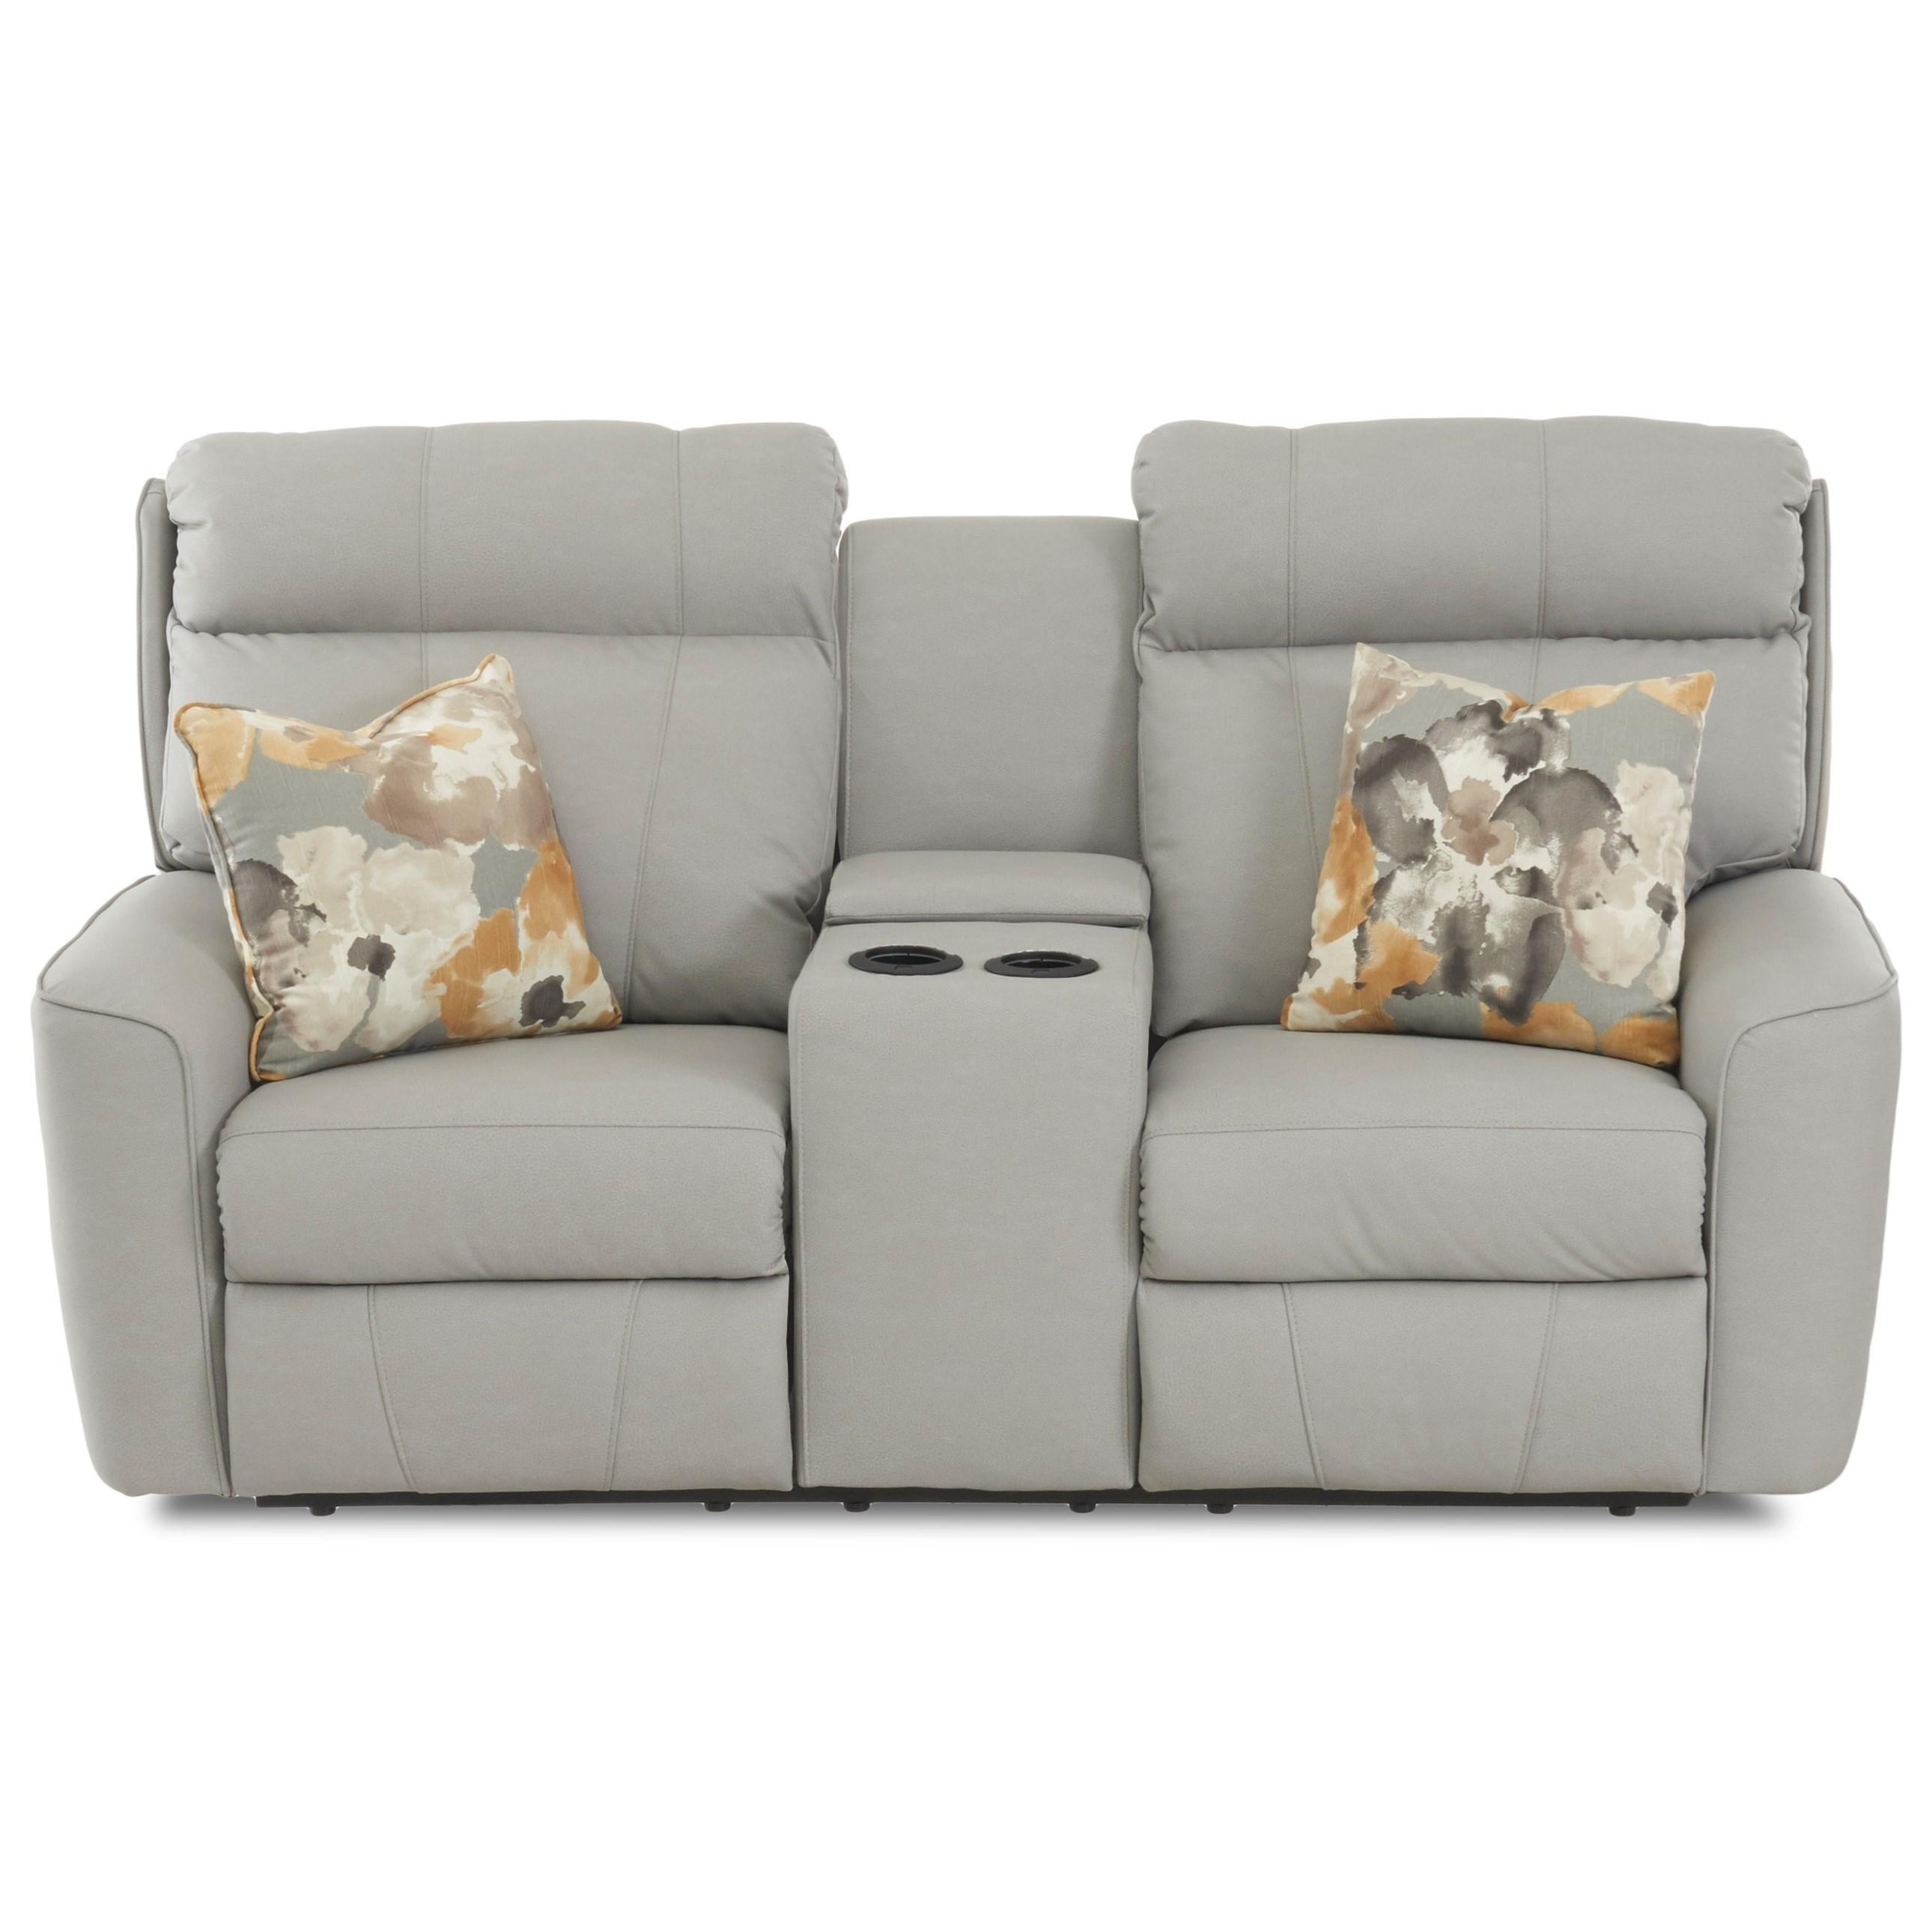 Klaussner Elara Console Reclining Loveseat w/ Pillows - Item Number: 67243P CRLS-POMP LIGH